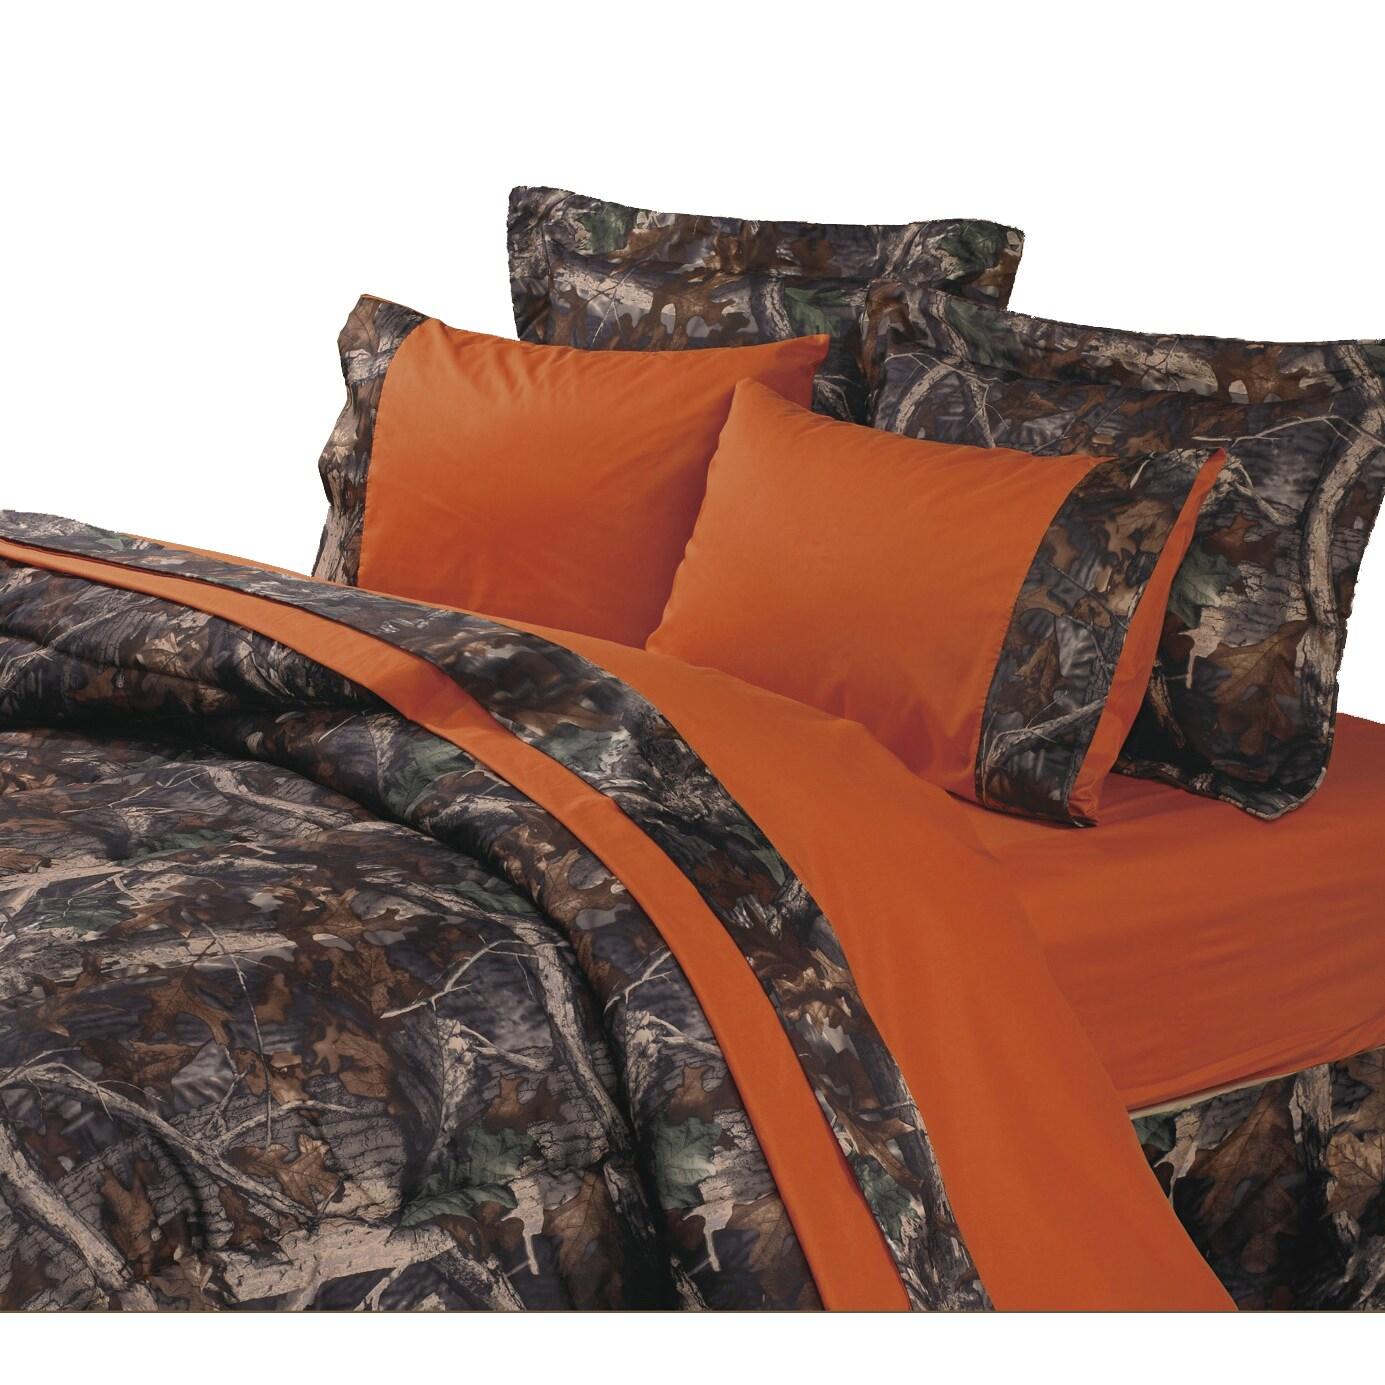 HiEnd Accents Camo Sheet Set Orange (4 Piece - King) (Pol...